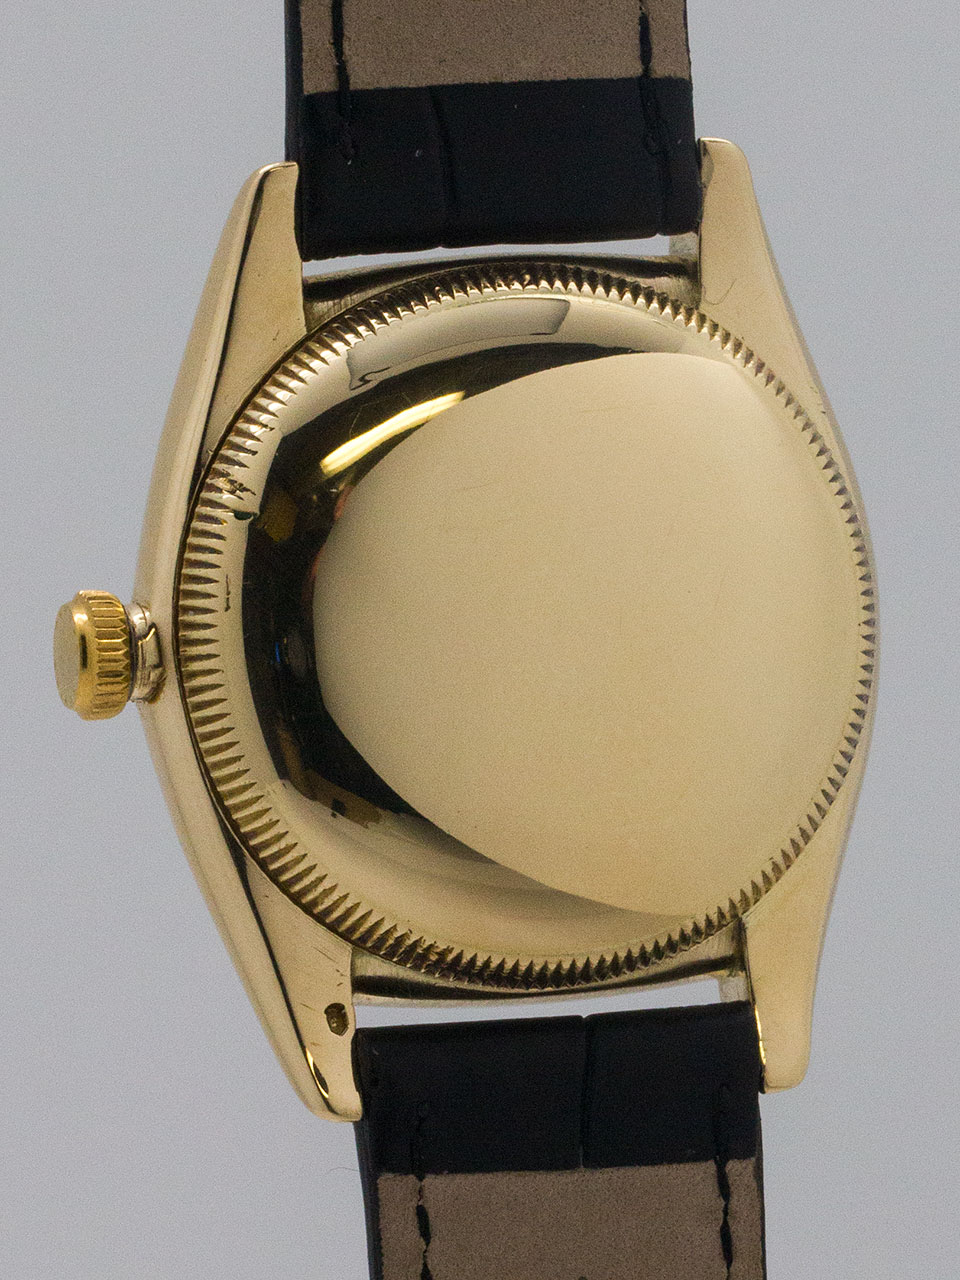 Rolex Bubbleback ref 3131 14K YG circa 1940's